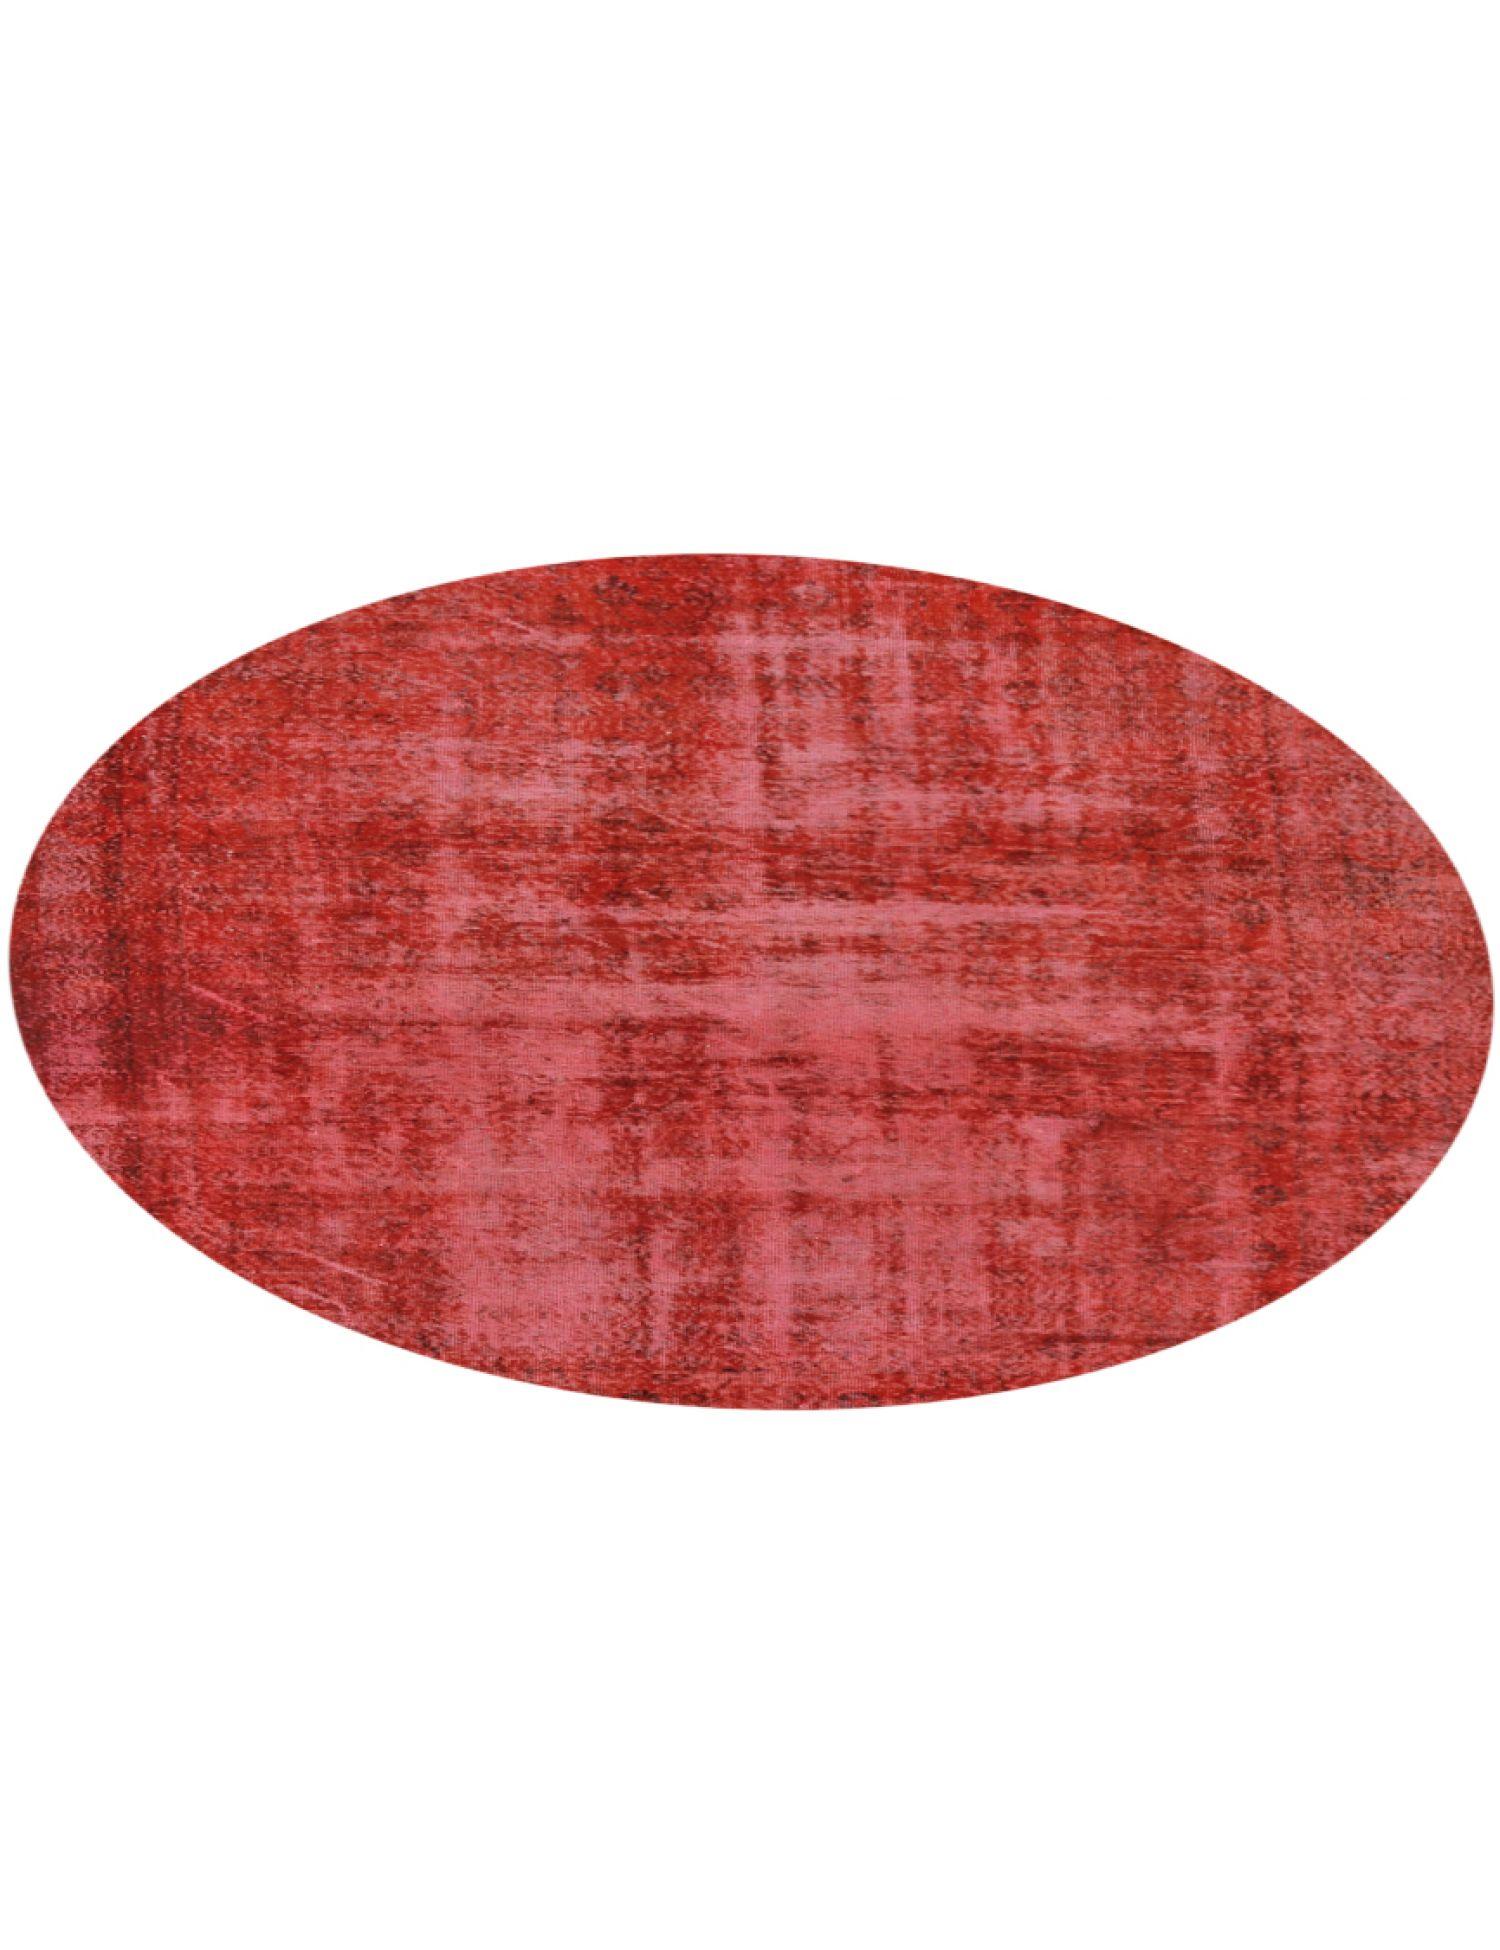 Tappeto Vintage  rossio <br/>224 x 224 cm